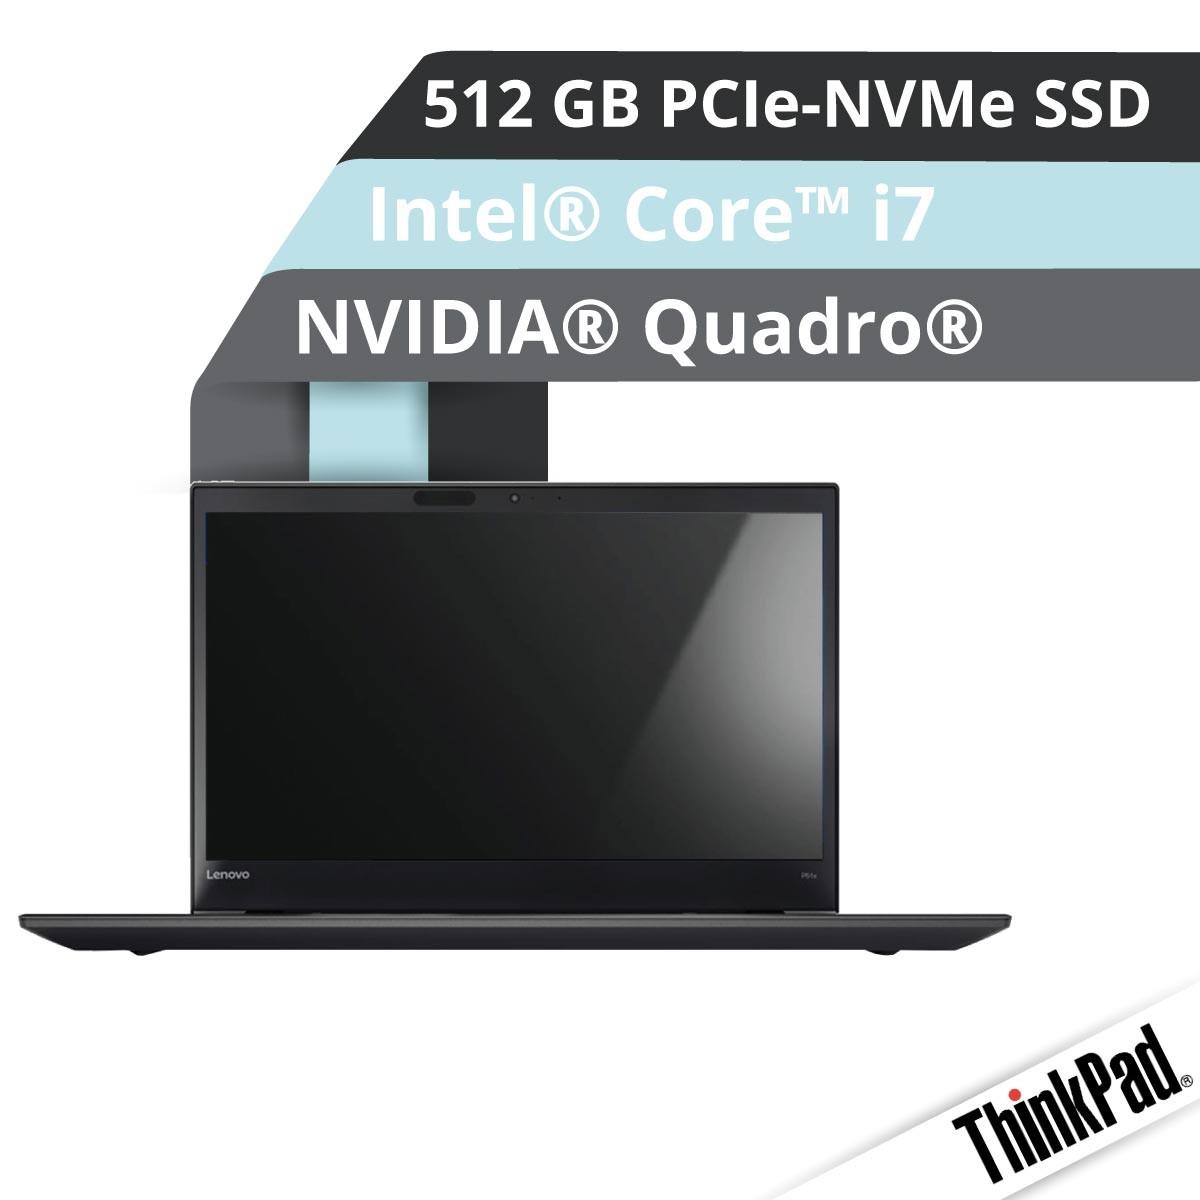 (EOL) Lenovo™ ThinkPad® P51s Workstation Modell 20HB-000U